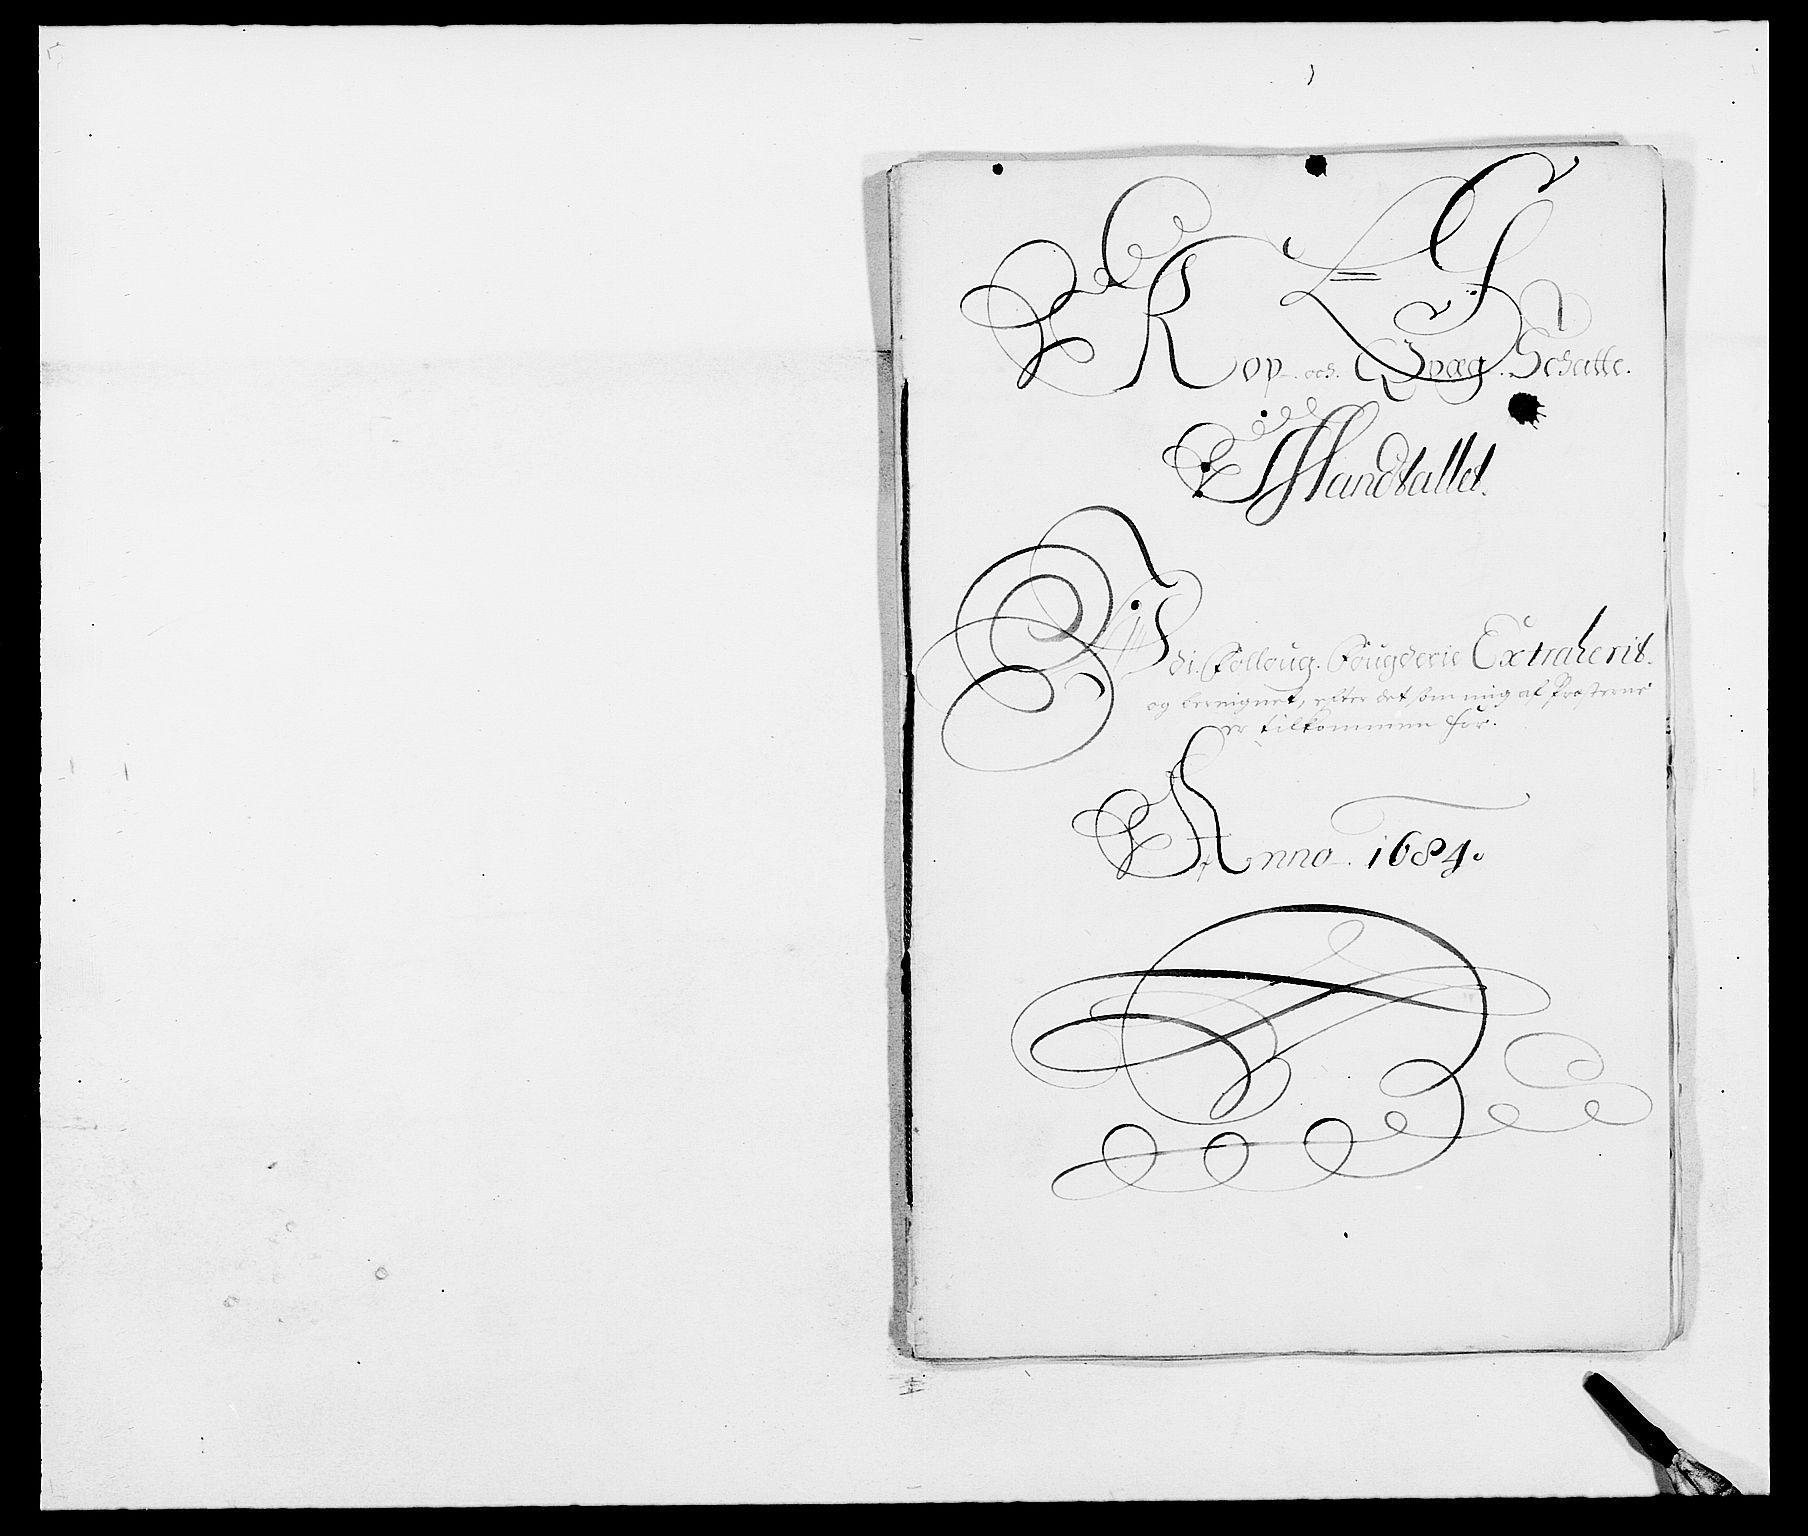 RA, Rentekammeret inntil 1814, Reviderte regnskaper, Fogderegnskap, R09/L0431: Fogderegnskap Follo, 1684, s. 203